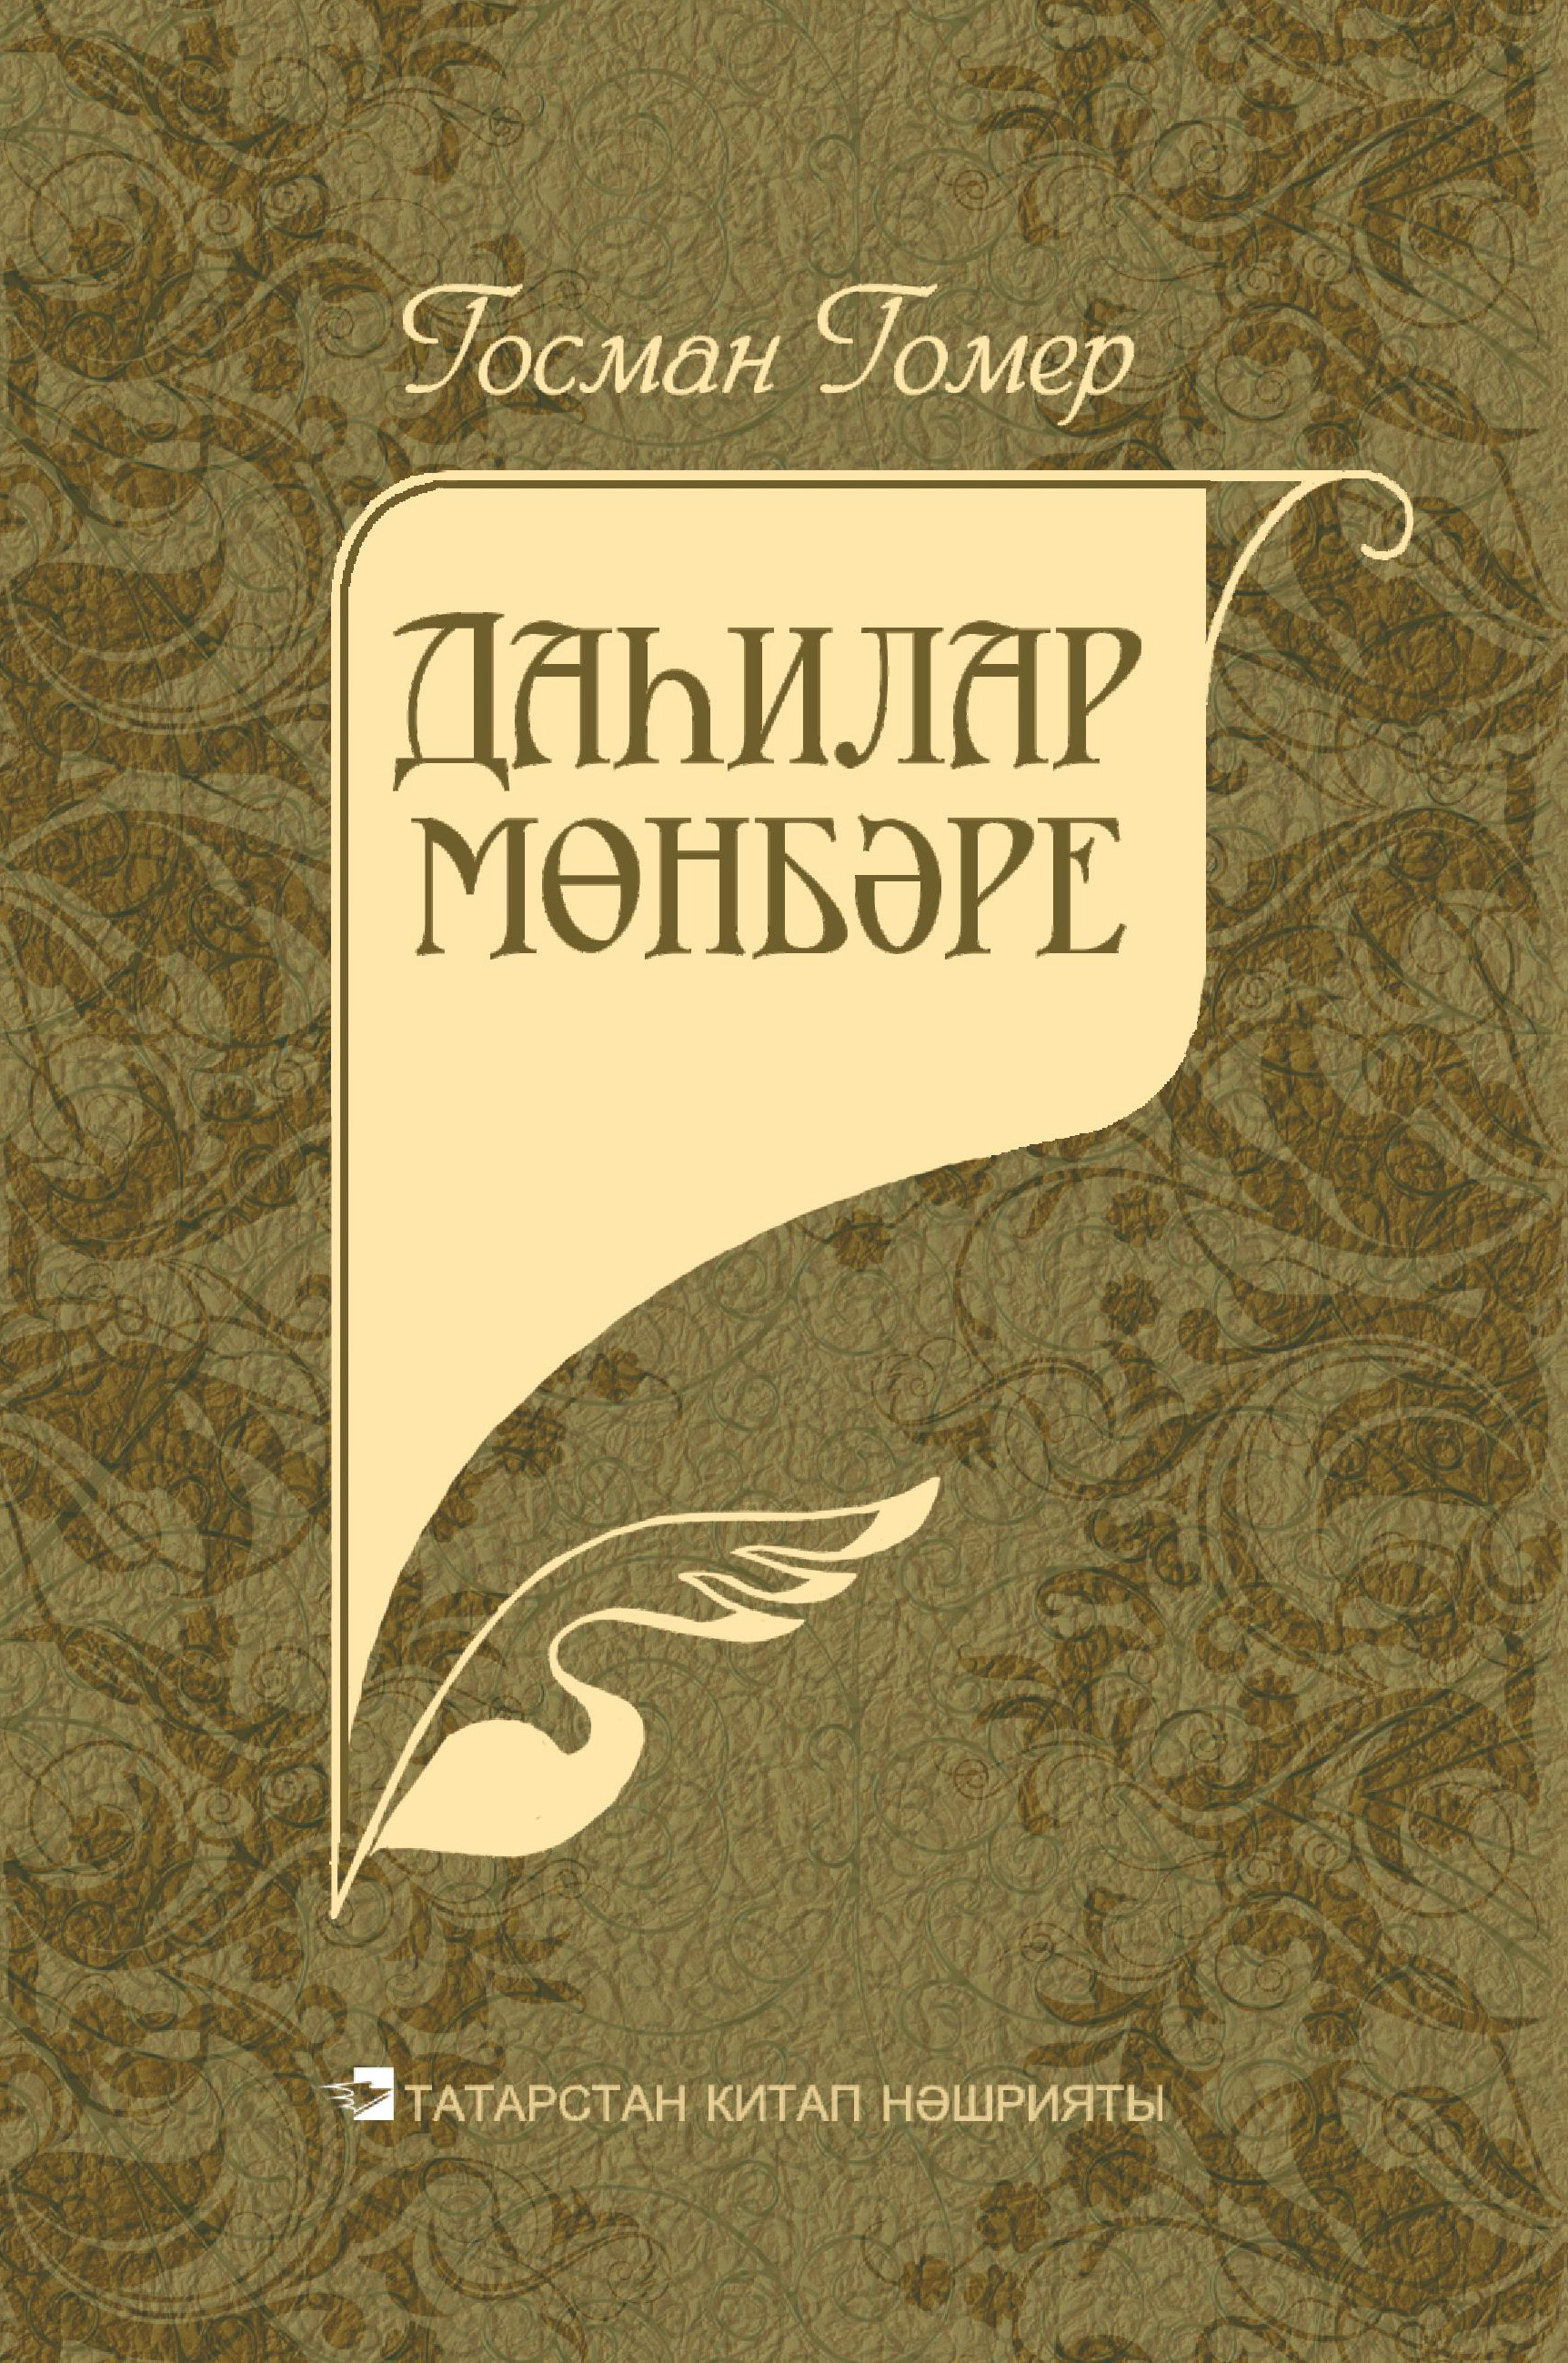 Обложка «Даһилар мөнбәре»